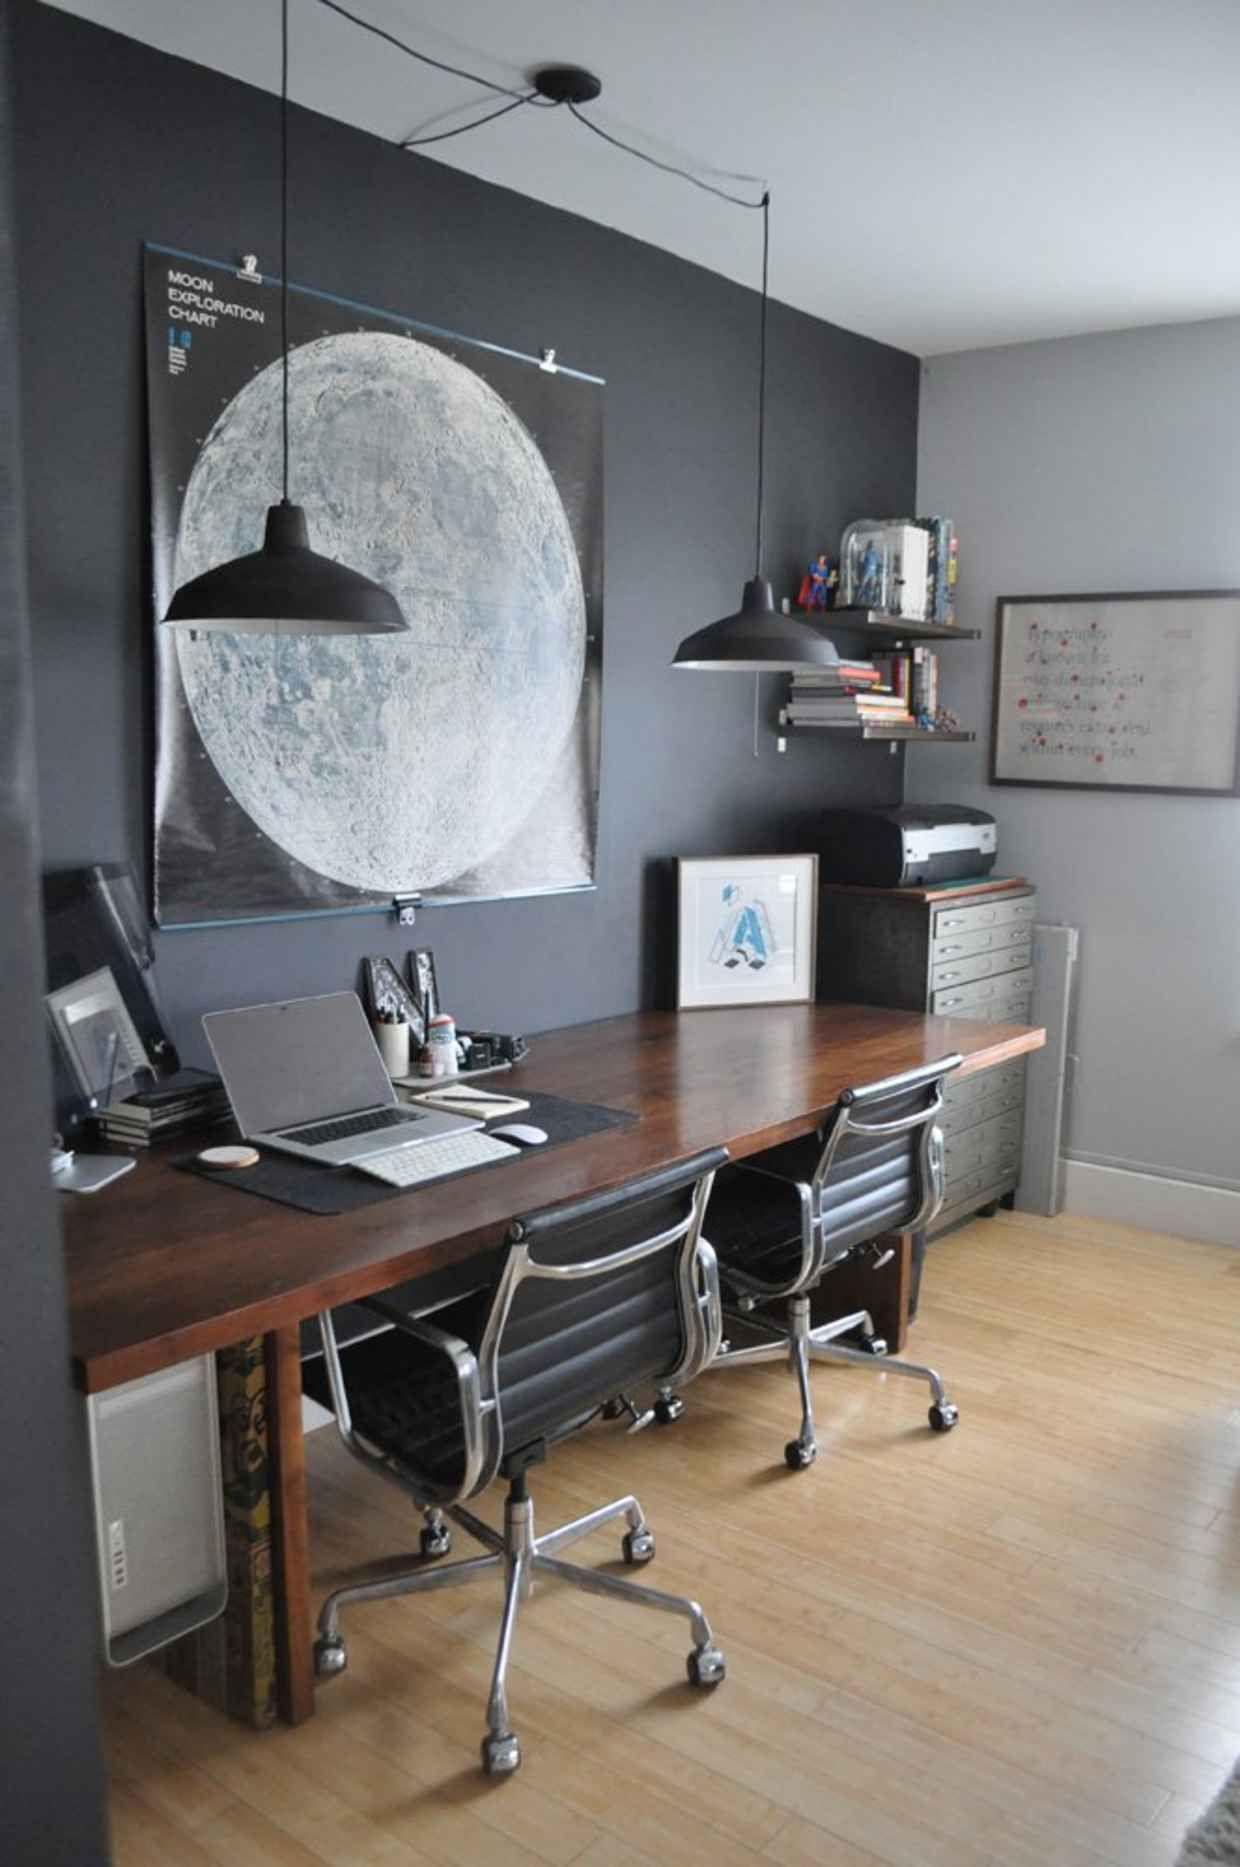 Inspiring Examples Of Minimal Interior Design 2 Home Office